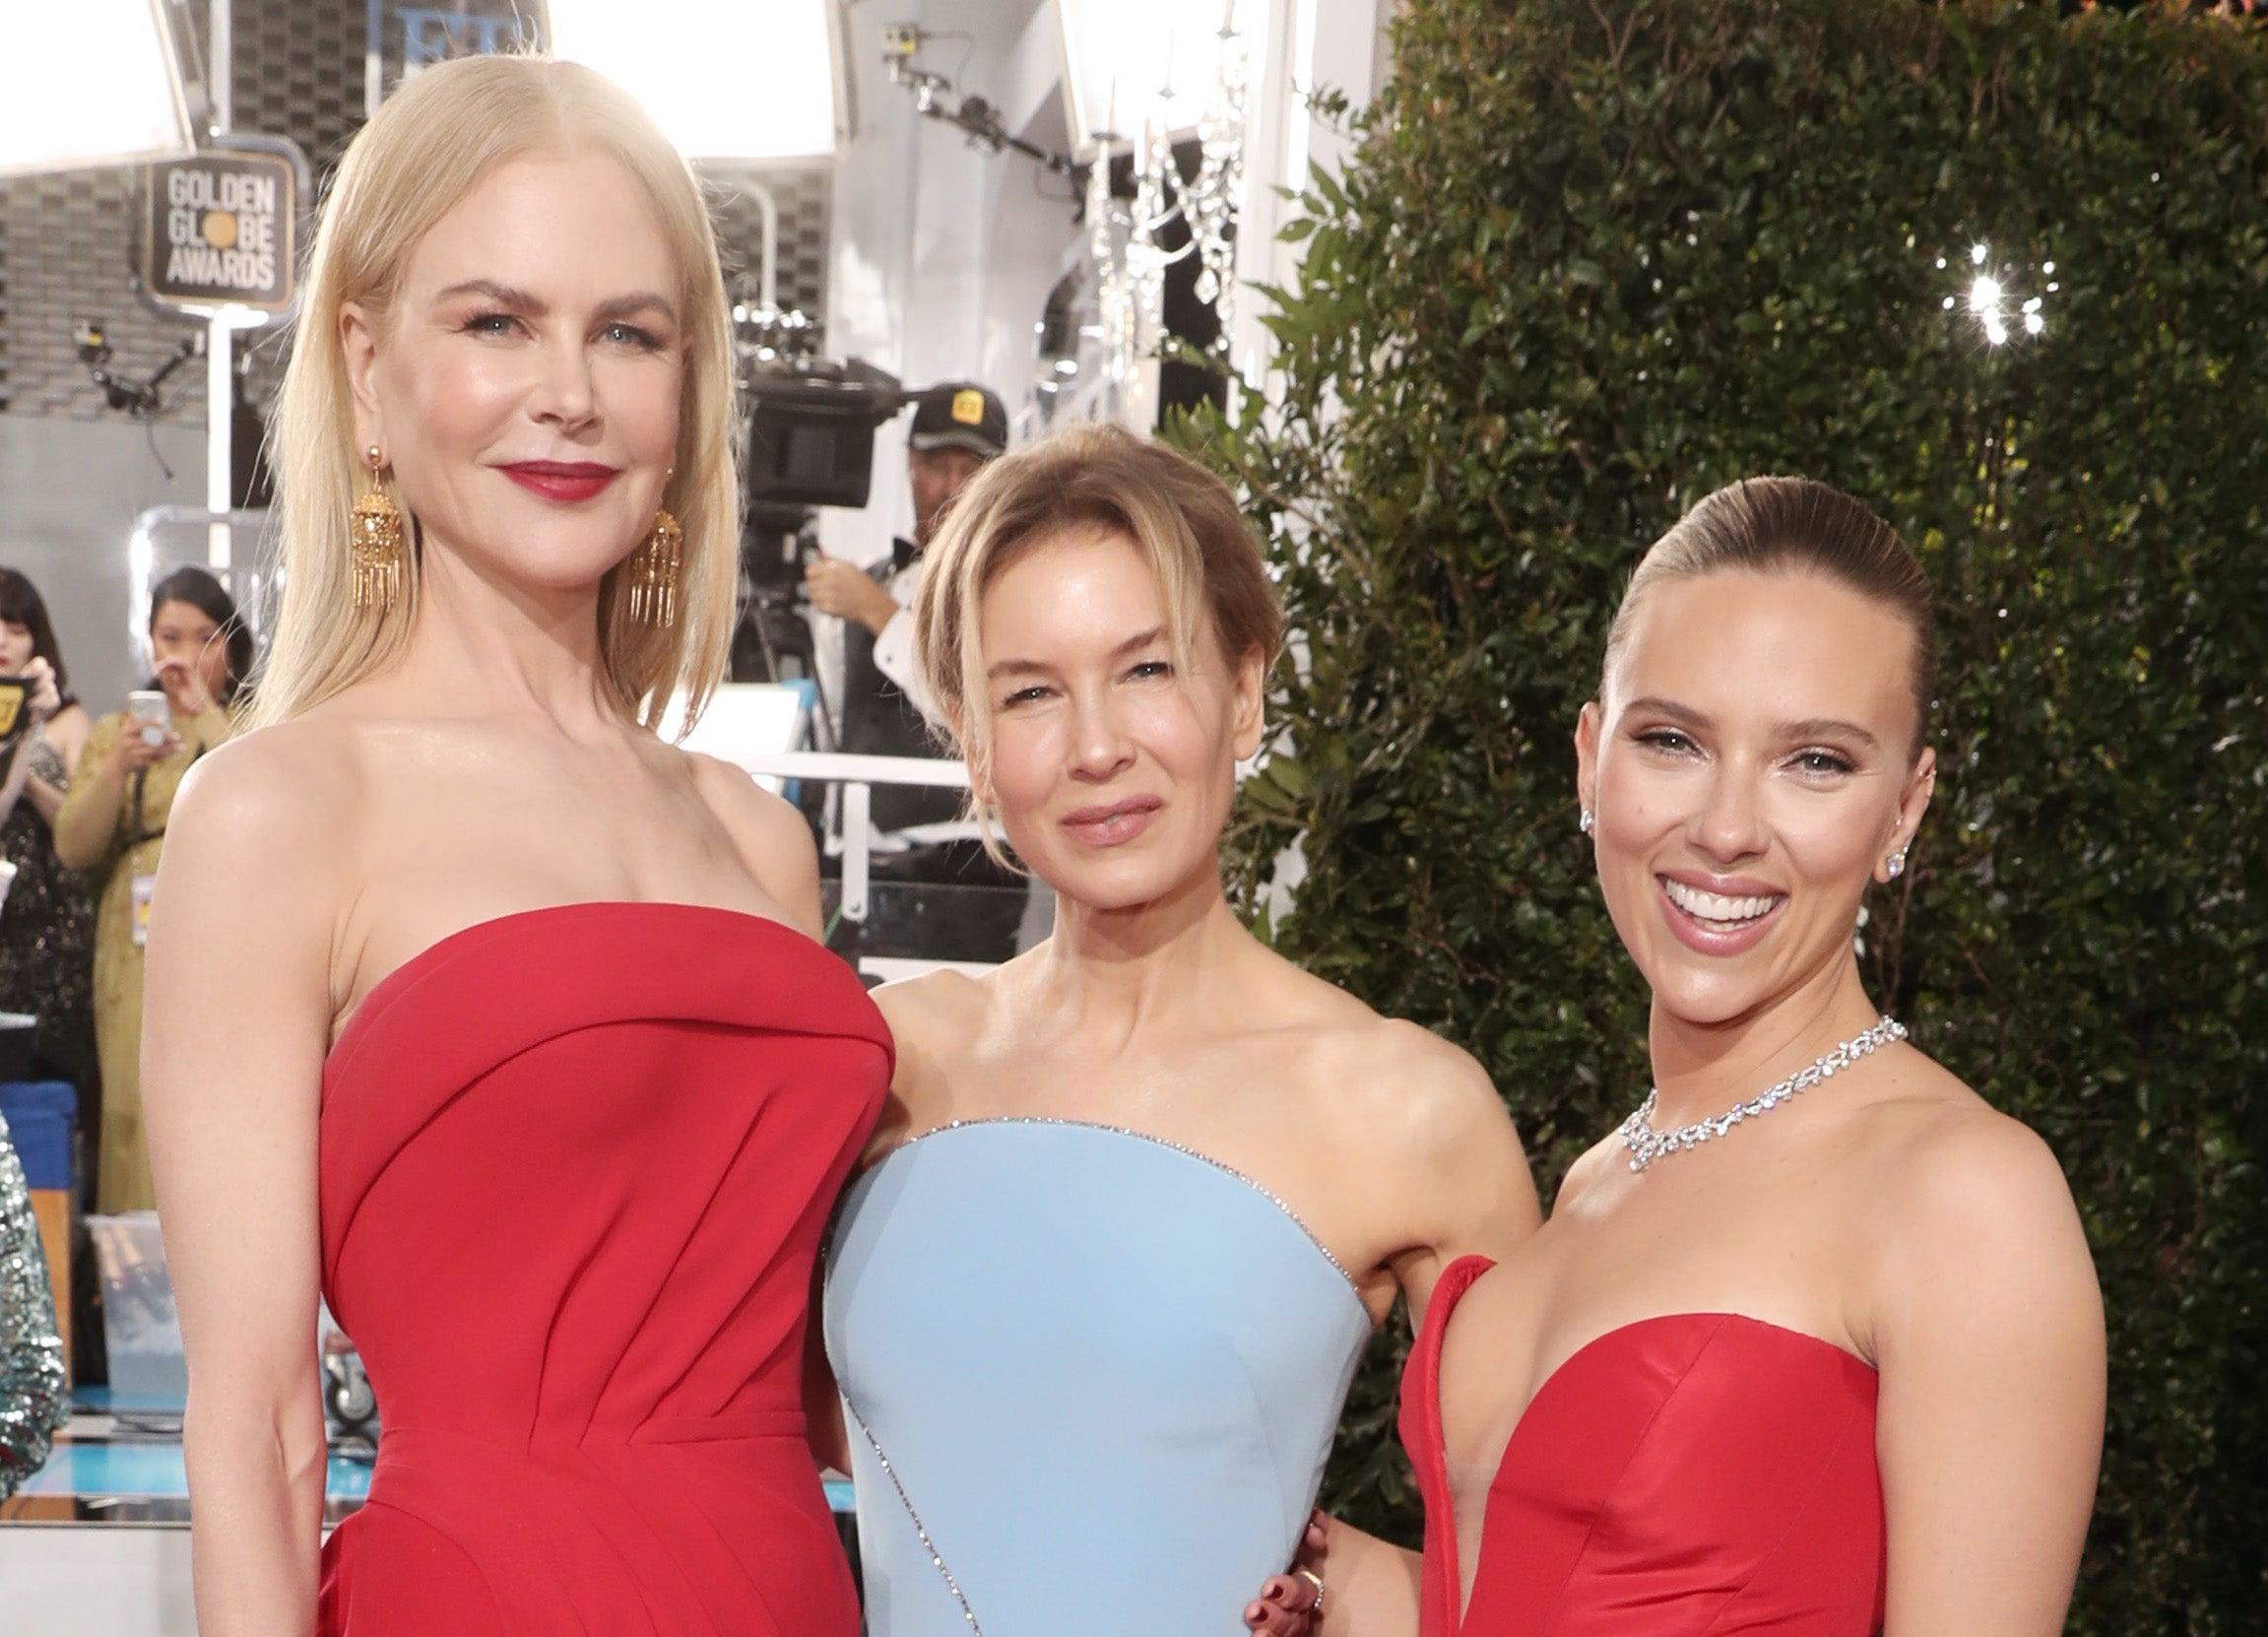 Nicole Kidman, Renée Zellweger a Scarlett Johansson         Autor: Todd Williamson/NBC/NBCU Photo Bank via Getty Images